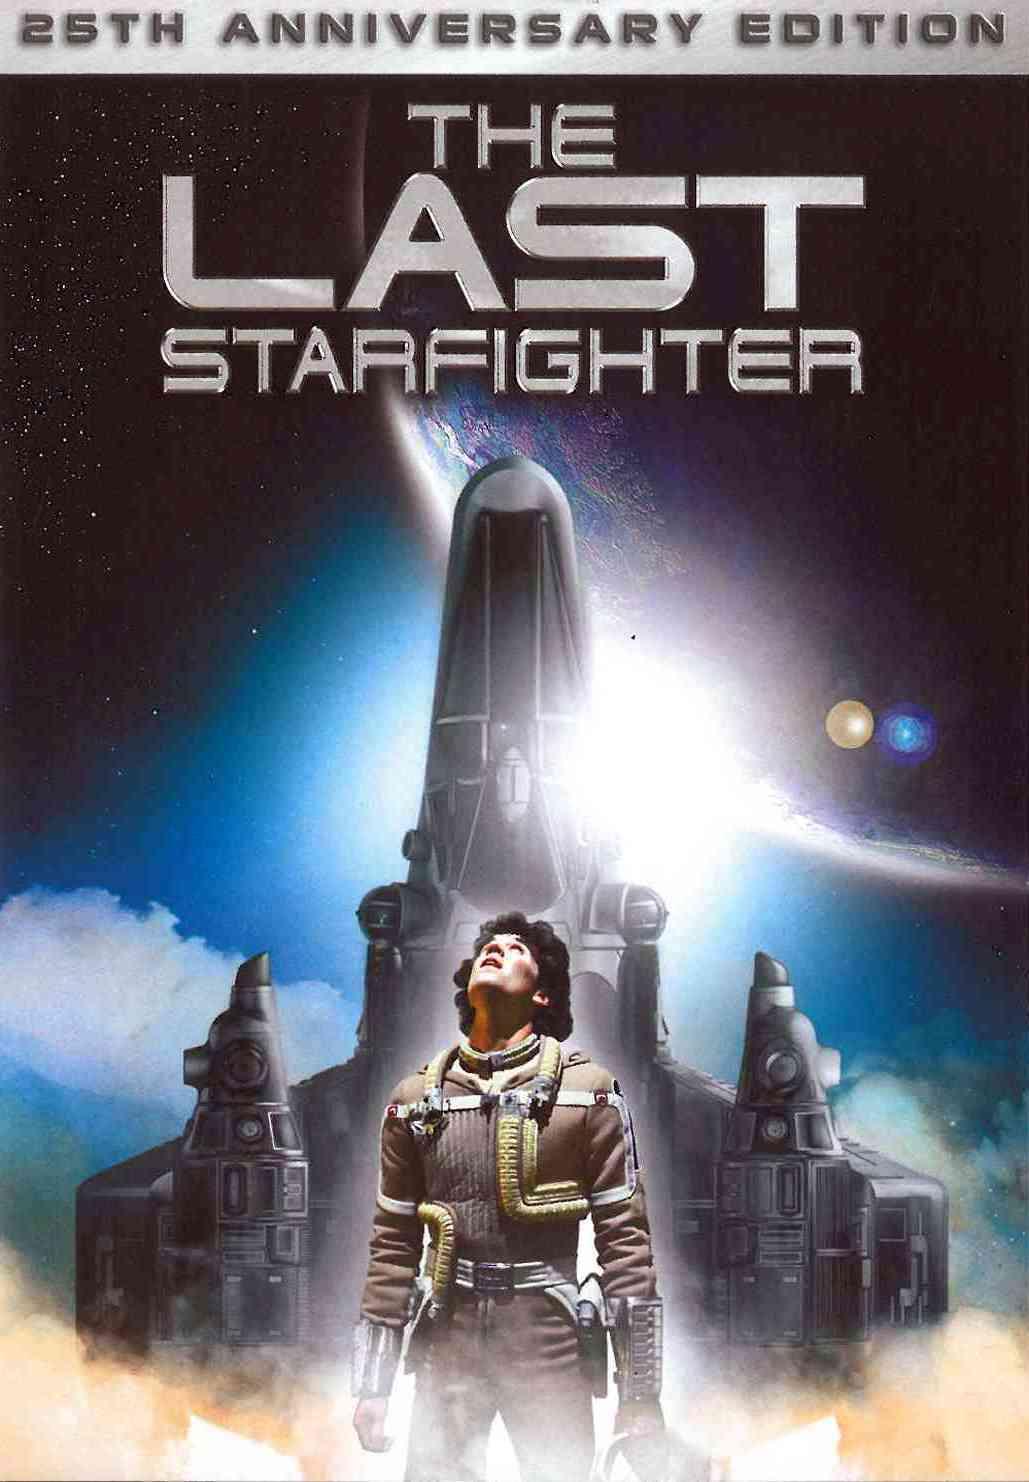 The Last Starfighter 25th Anniversary Edition (DVD)